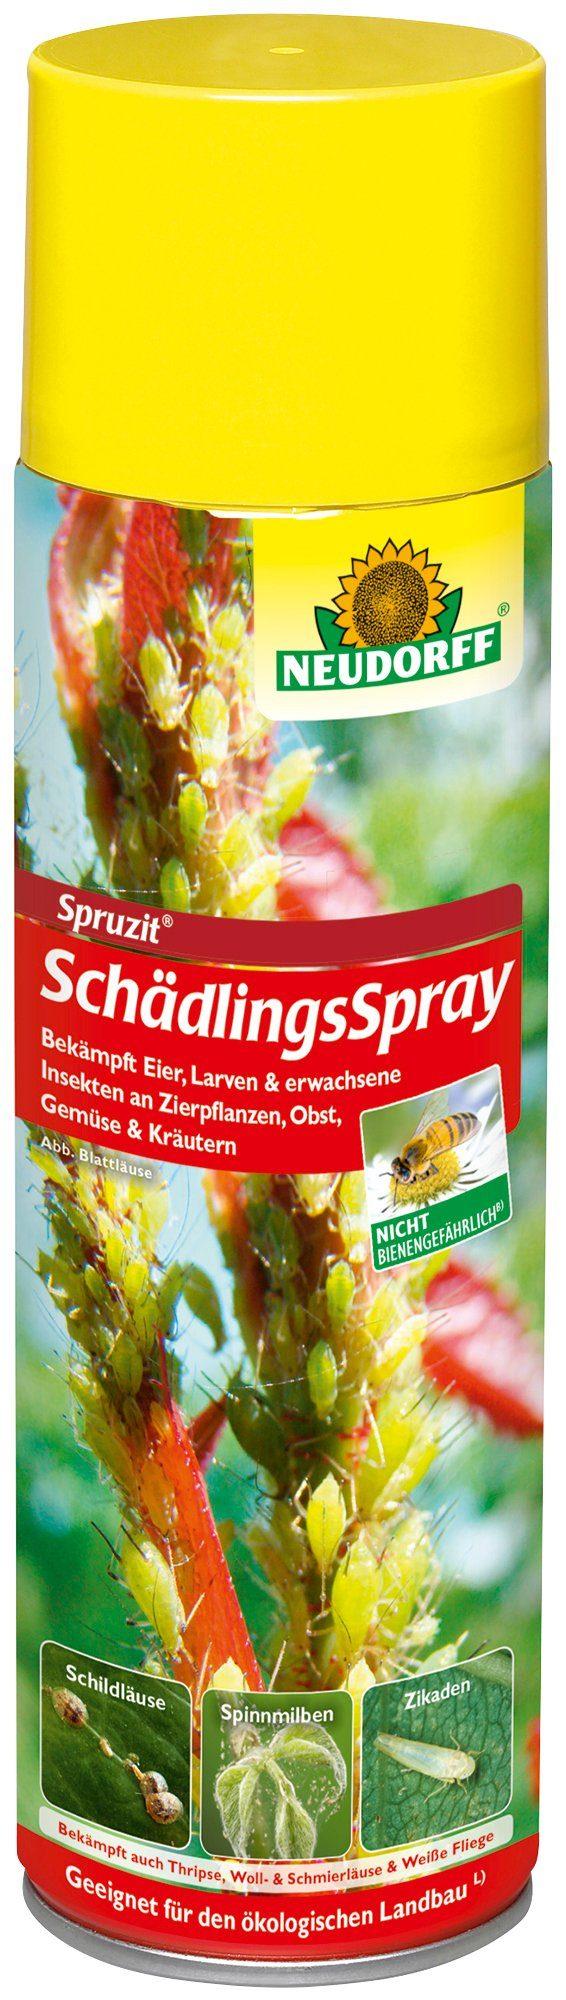 NEUDORFF Pflanzenschutz »Spruzit«